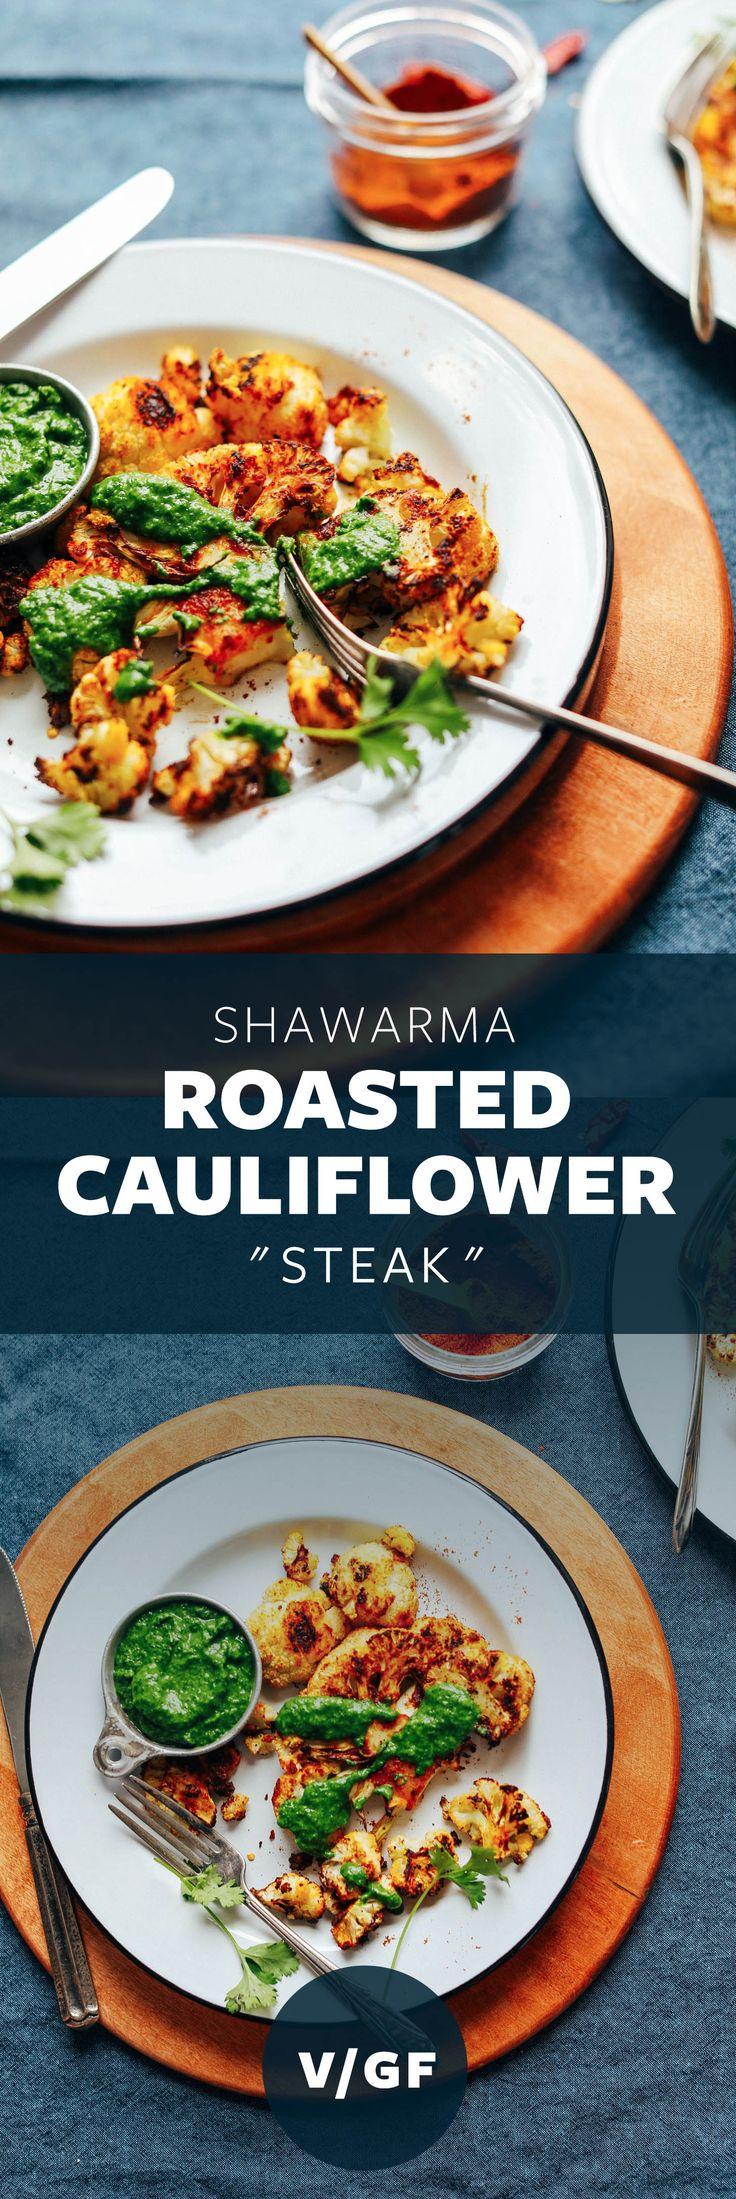 DELICIOUS Shawarma Roasted Cauliflower STEAK! 30 minutes, BIG flavor, served with Chutney! #vegan #glutenfree #minimalistbaker.